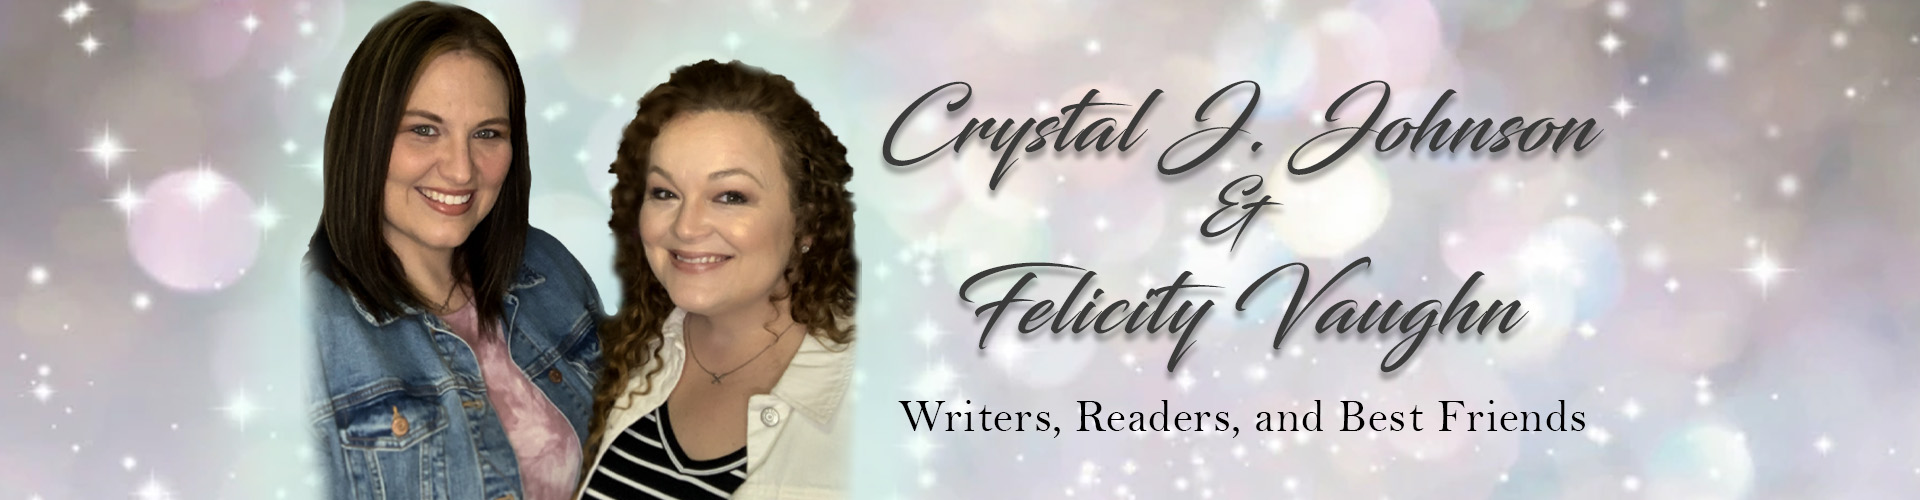 Authors Crystal J. Johnson and Felicity Vaughn